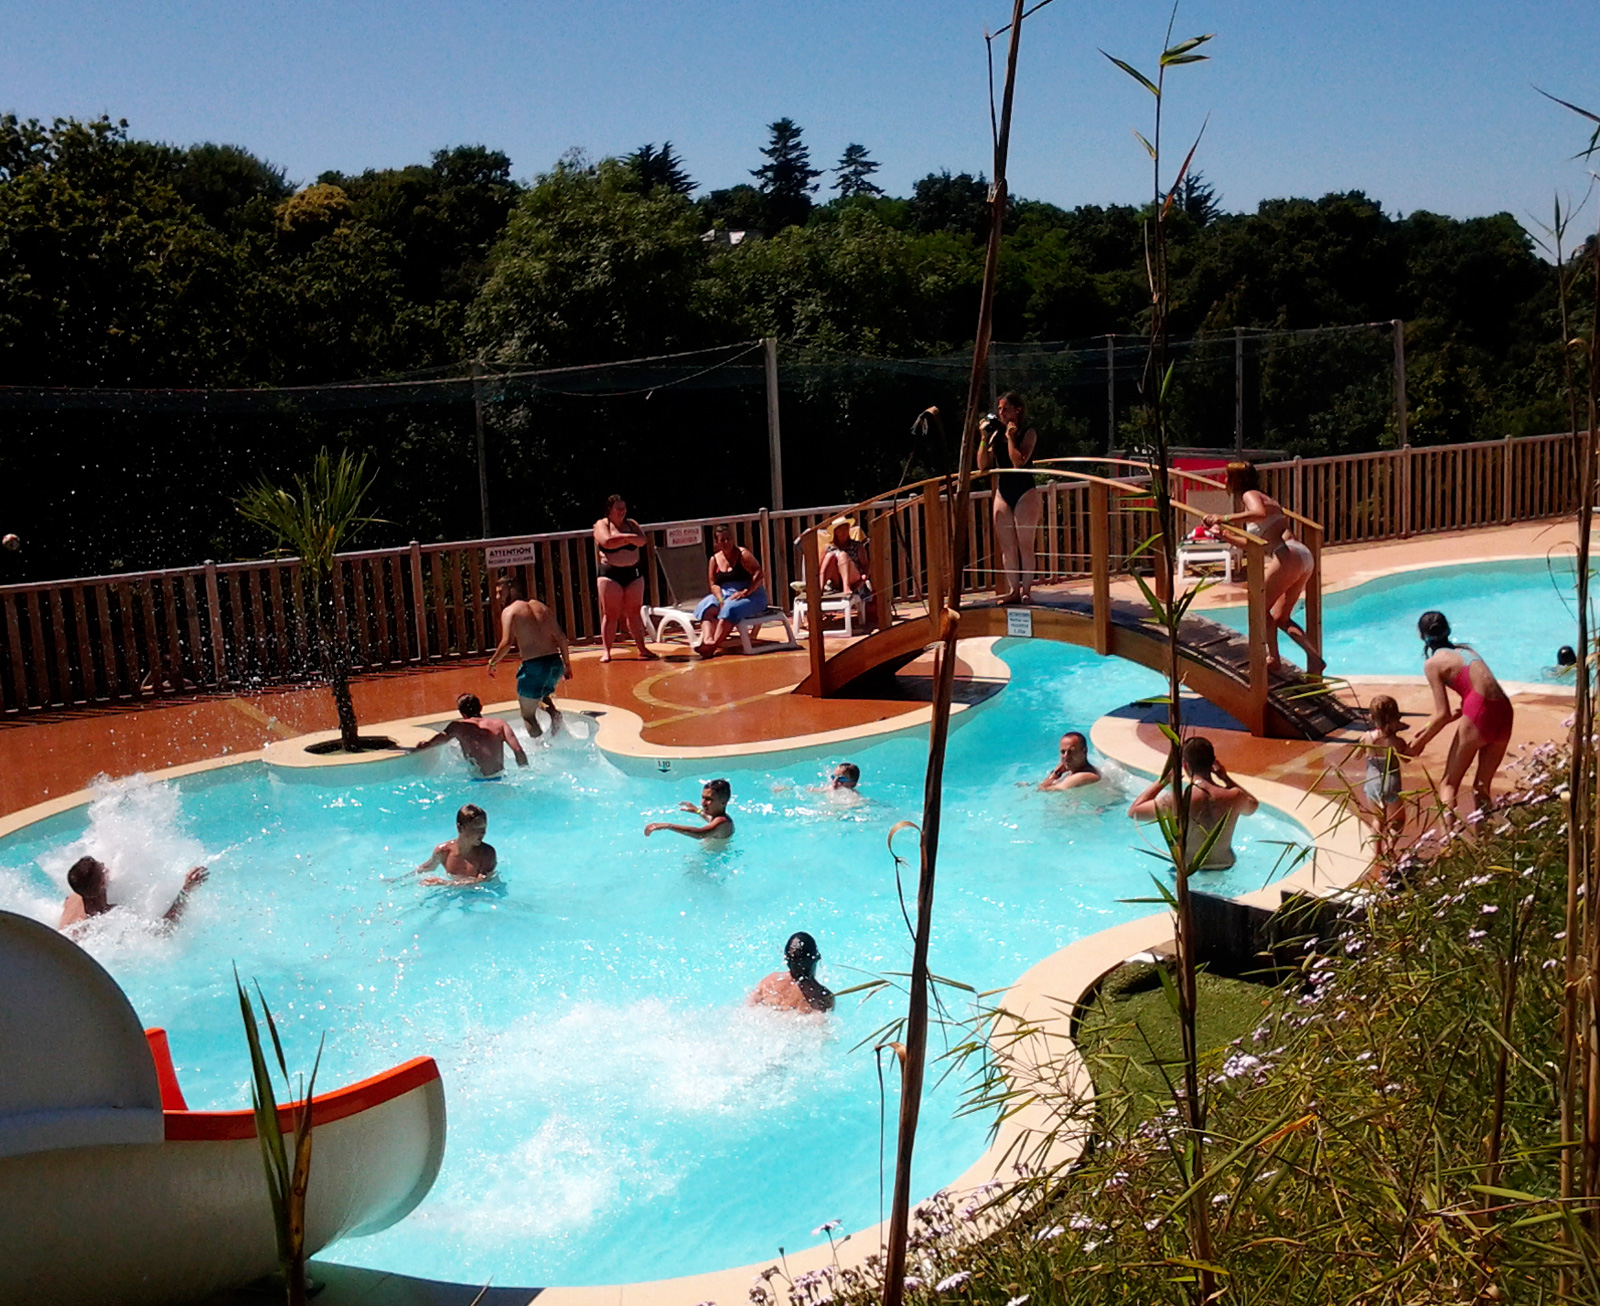 Camping en bretagne avec piscine couverte camping c tes for Camping fouesnant avec piscine